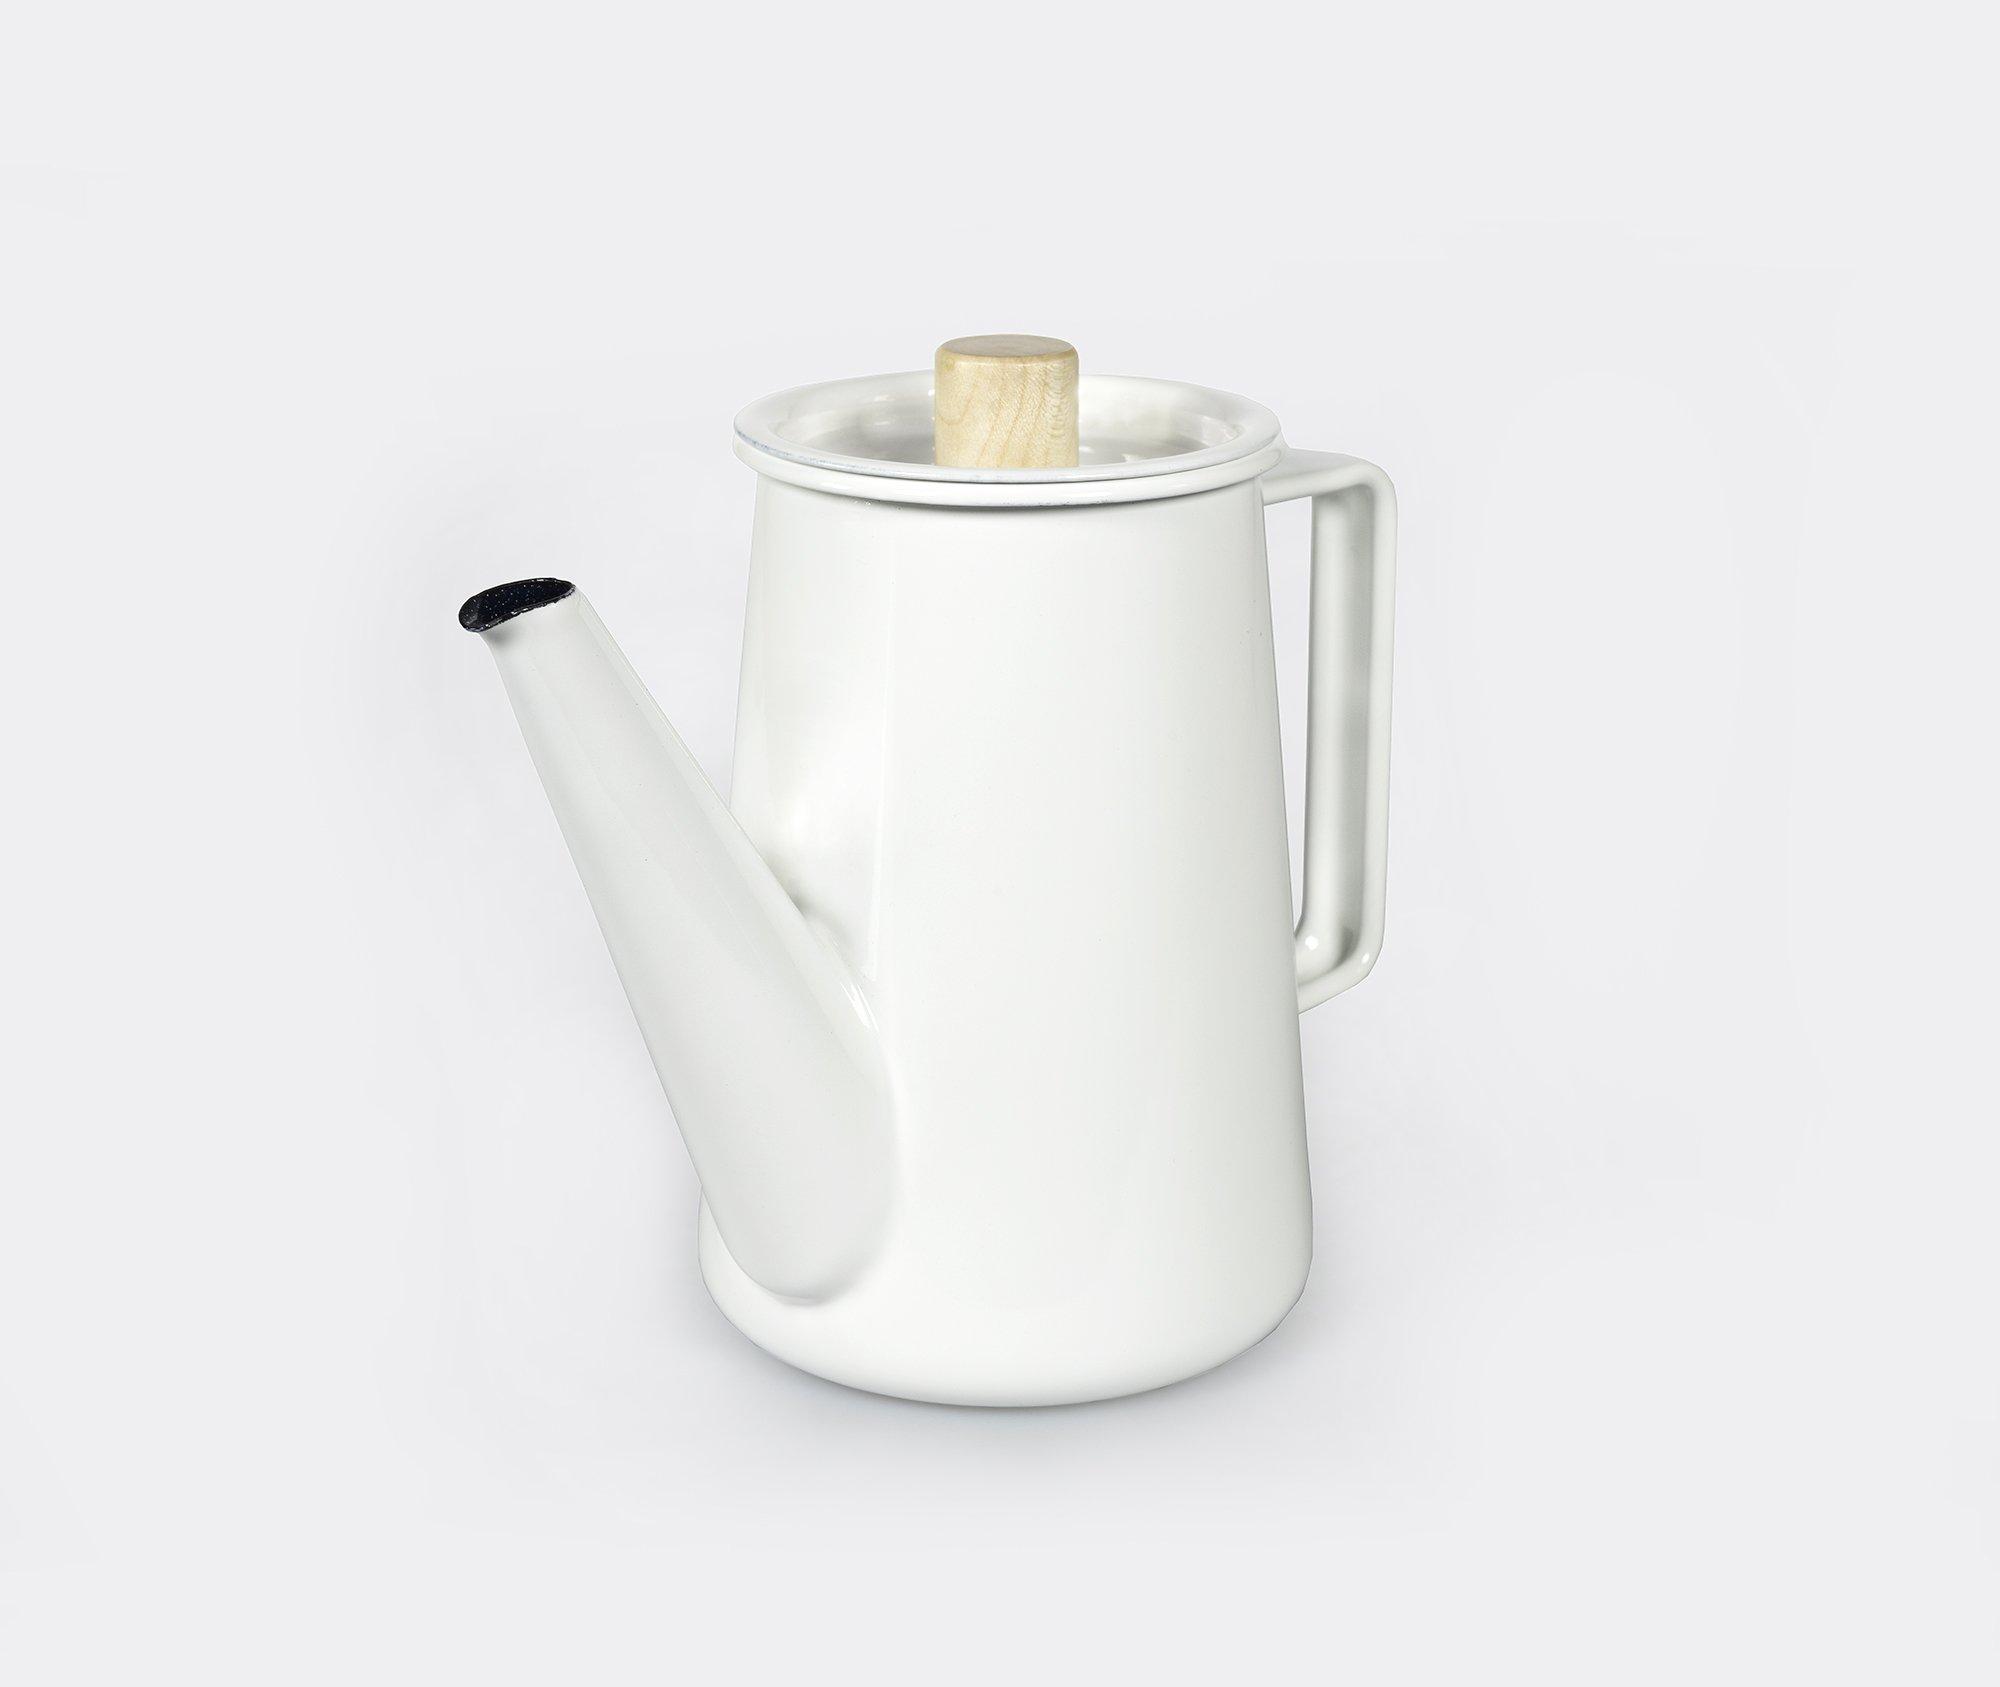 Kaico Japanese White Enamelware Coffee Pot from Koizumi Studio - Good Design Award Winner